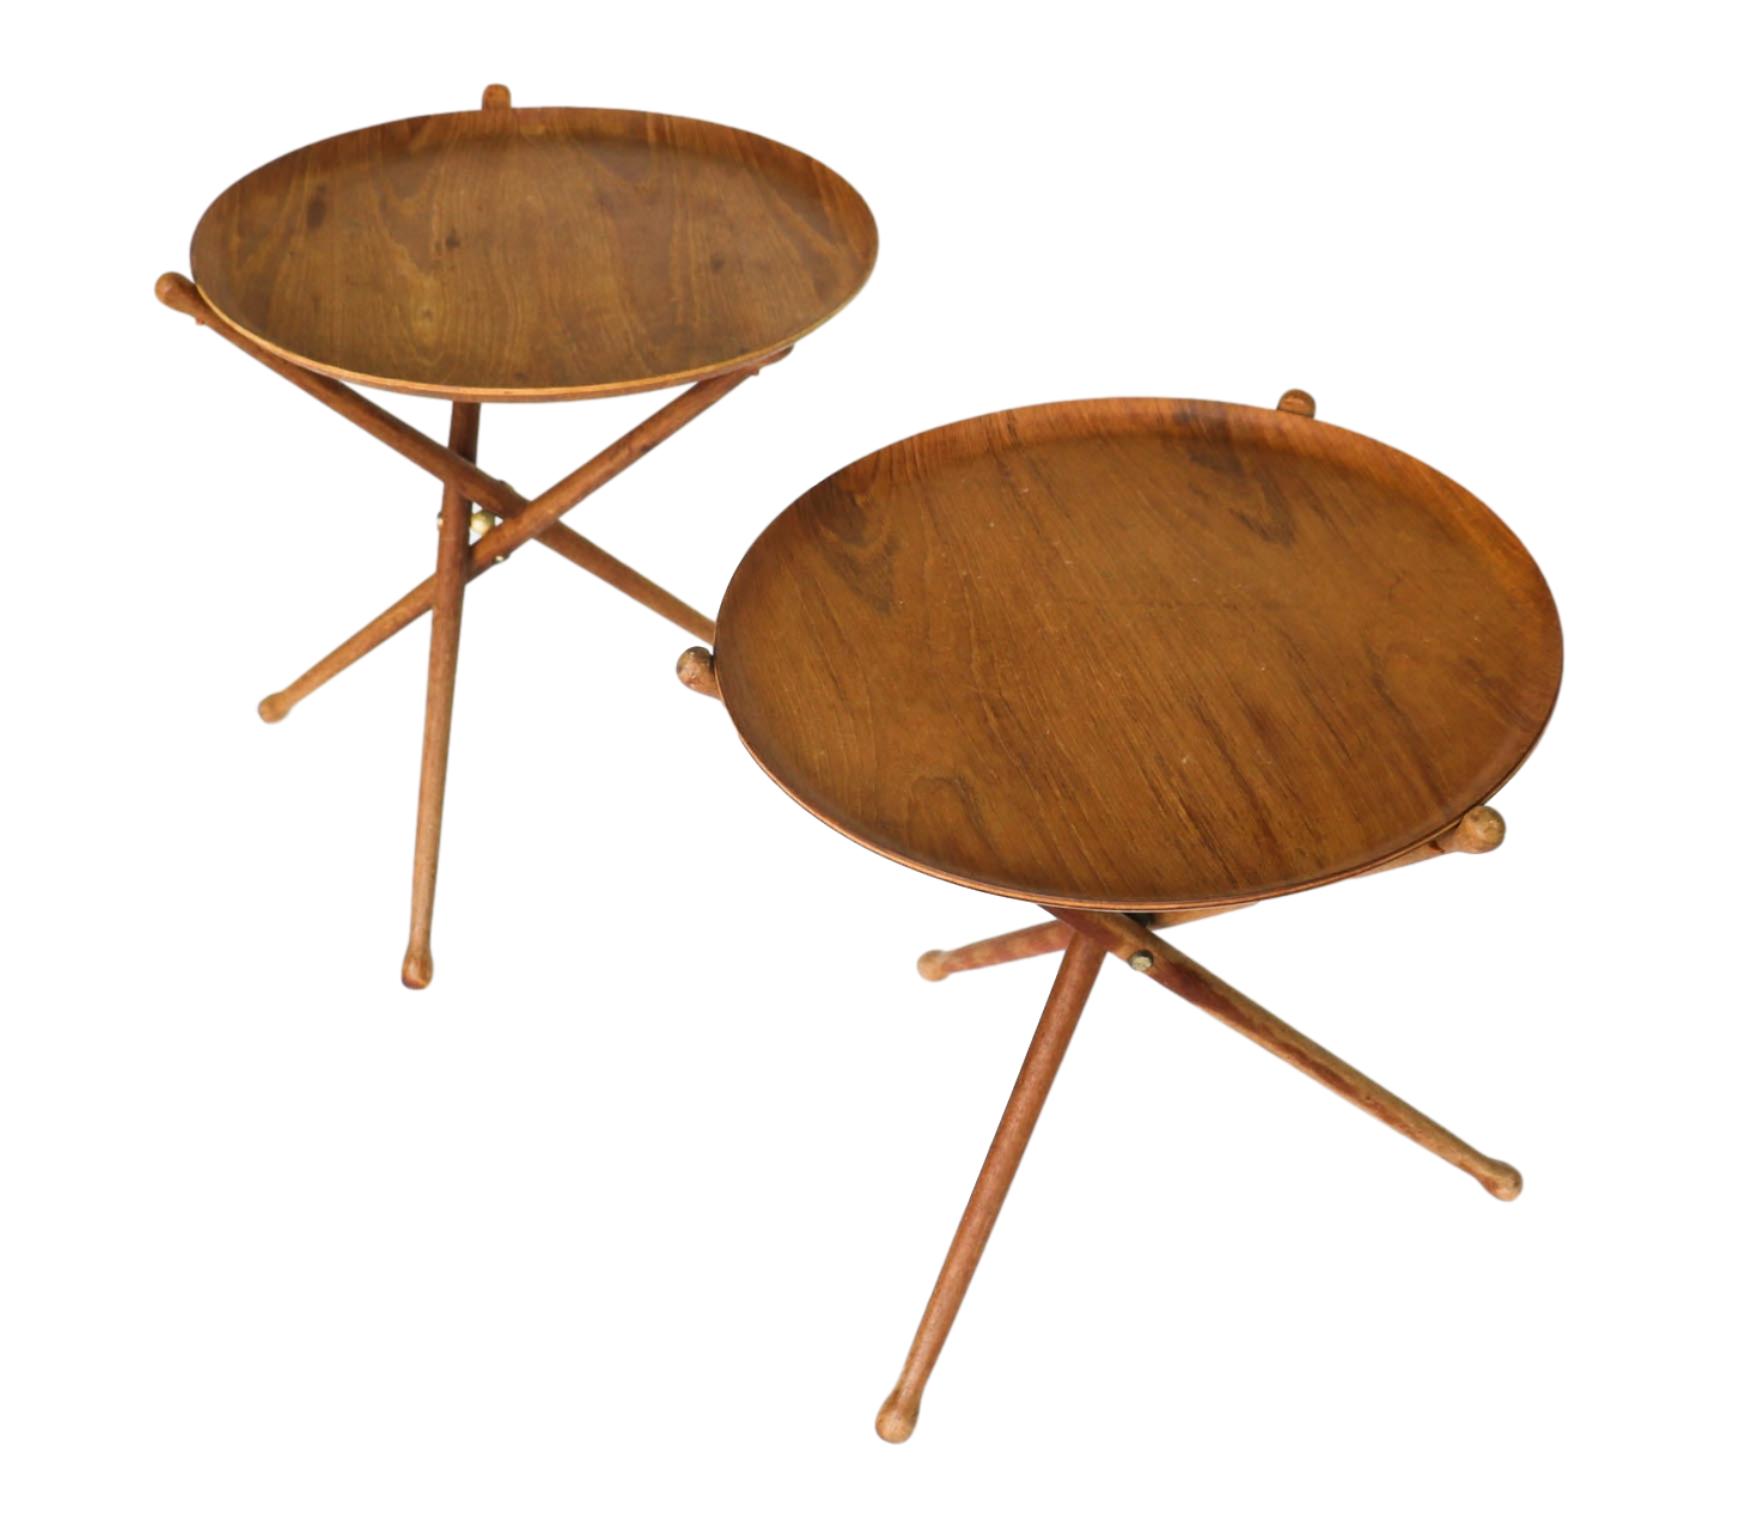 Danish Modern Nils Trautner teak folding tray side tables pair